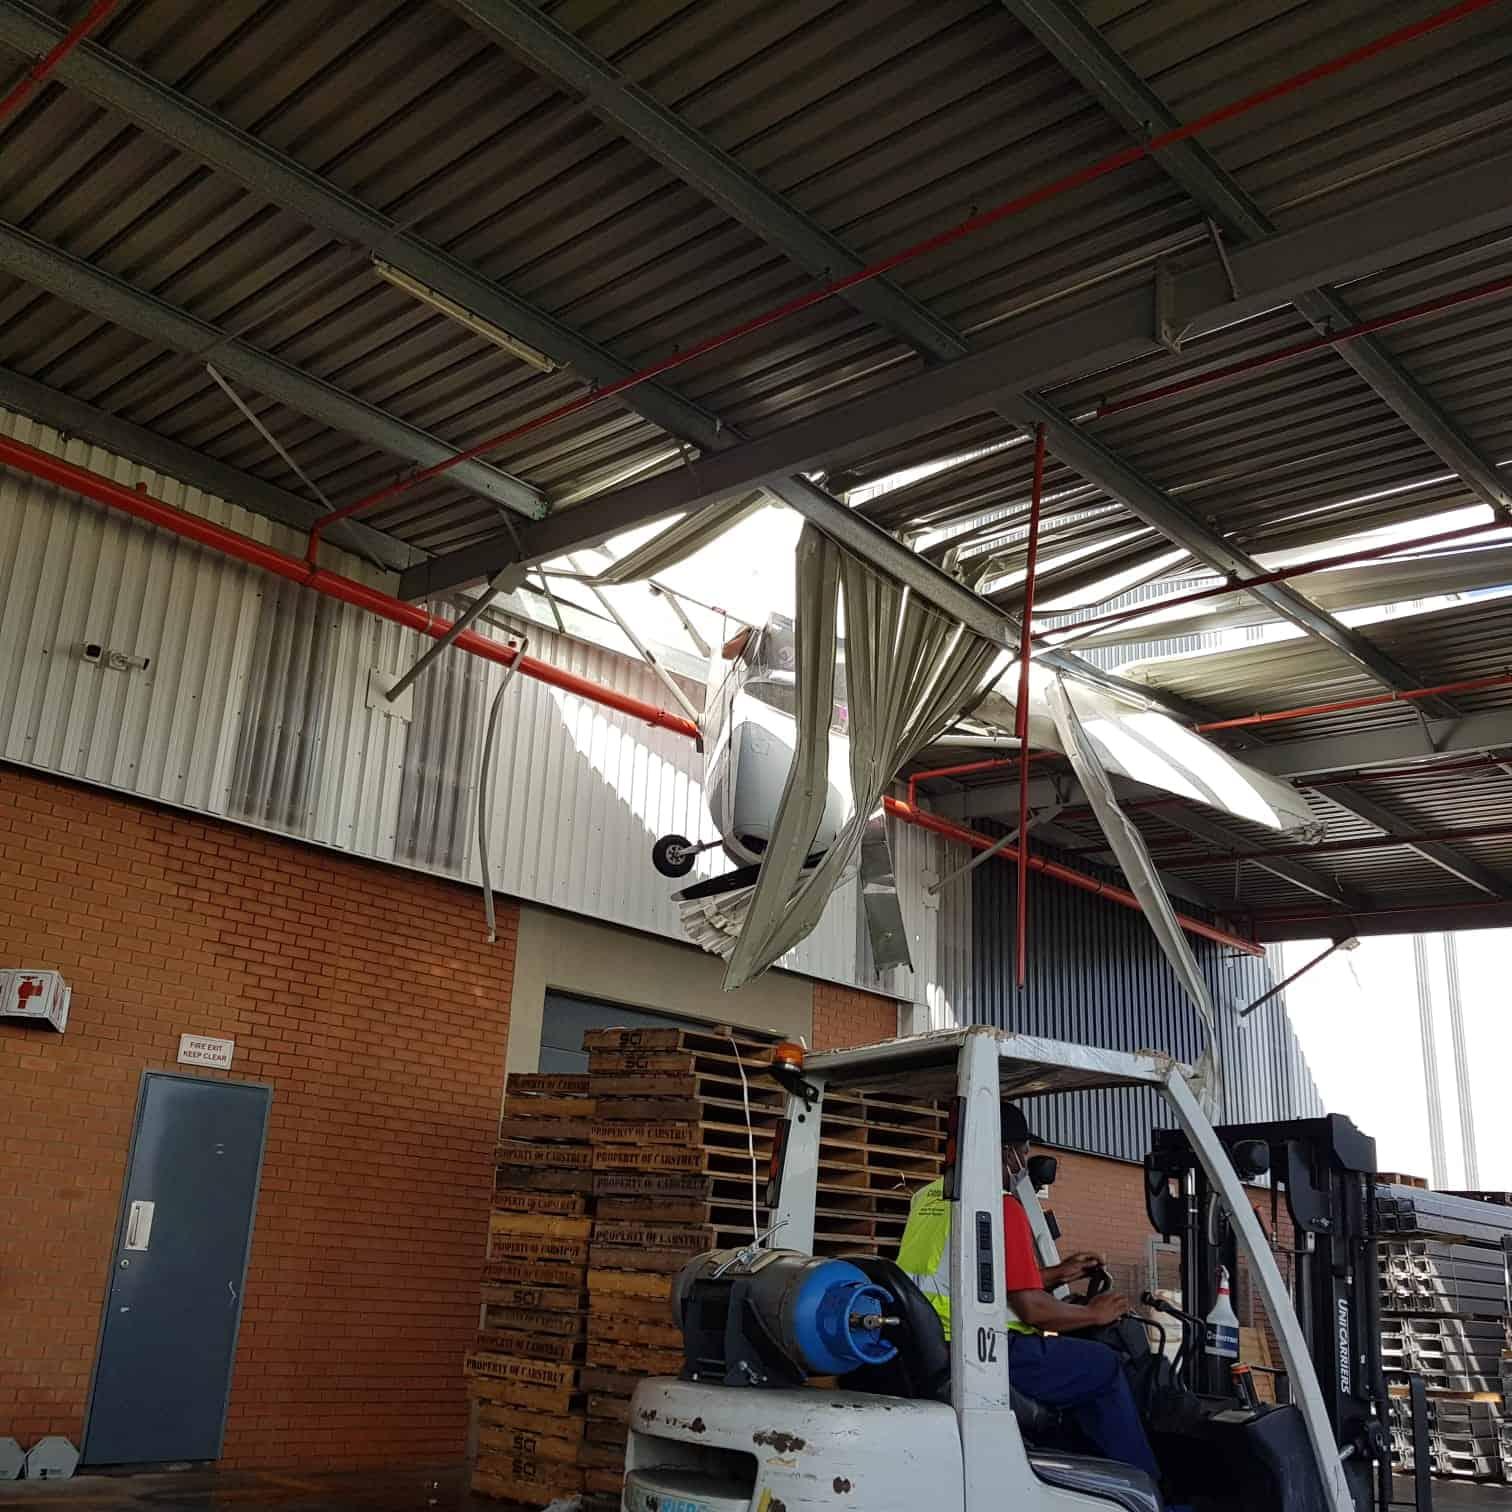 plane 2 - WTF? Plane slams into warehouse near Johannesburg [photos]